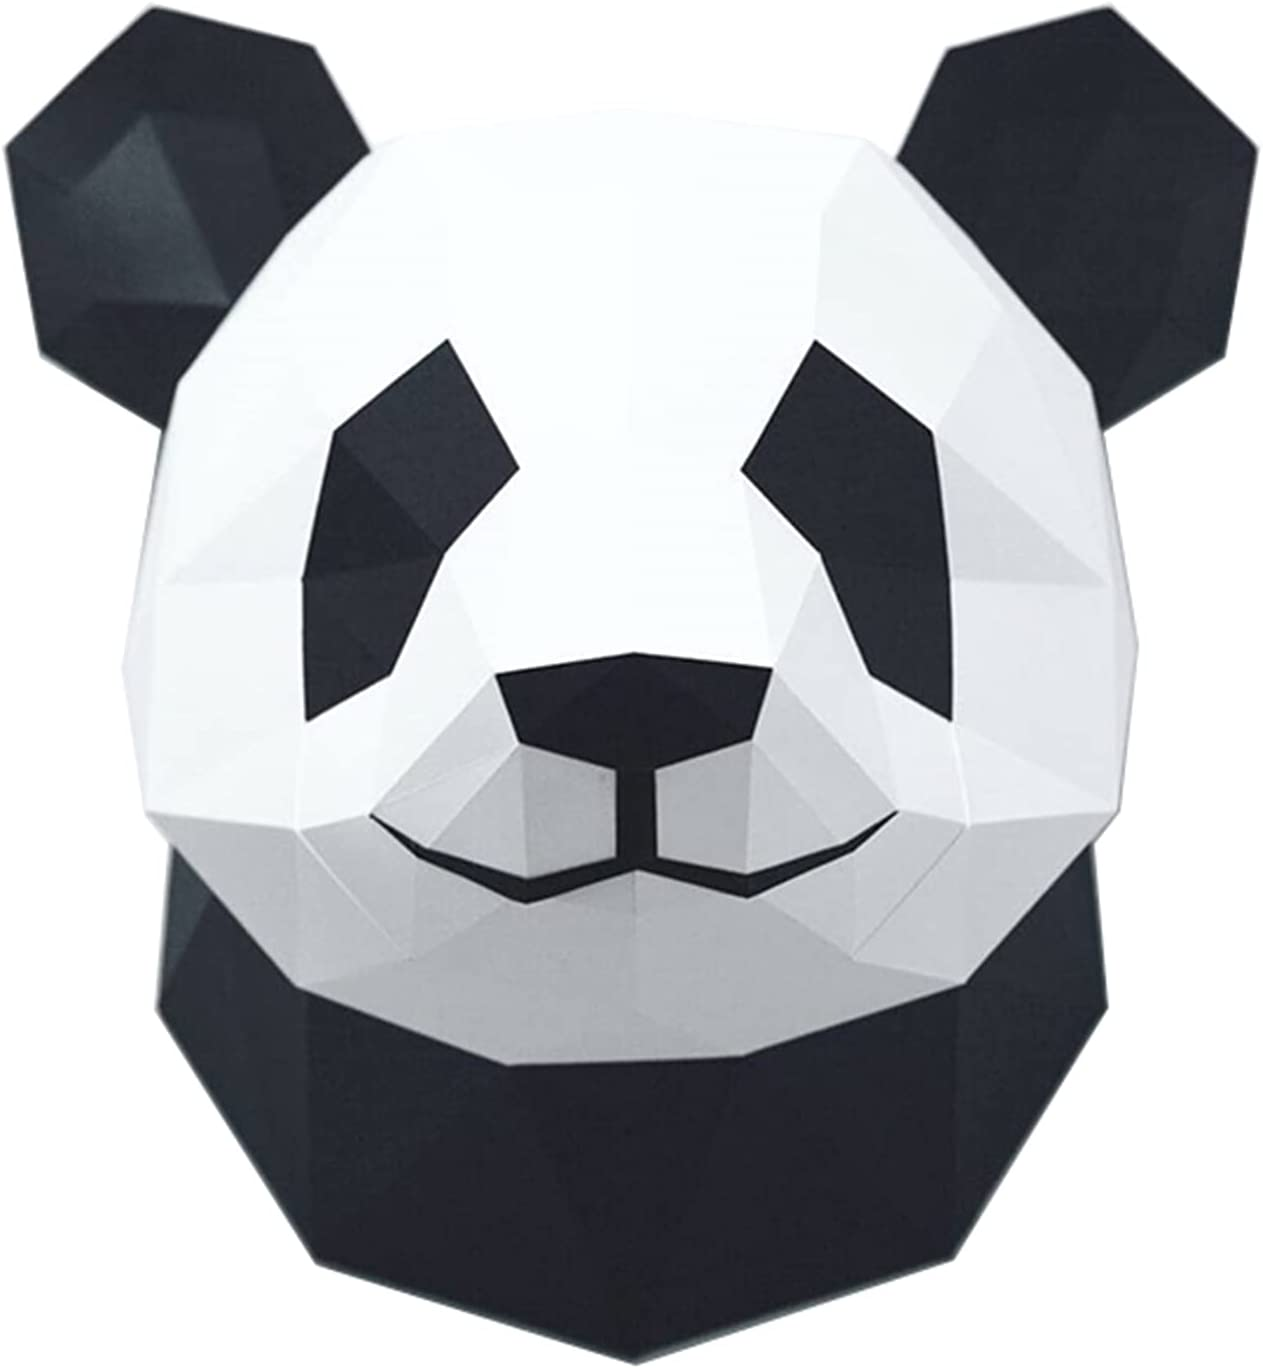 WLL-DP Panda New product!! Head Modeling Paper Creative 5 ☆ very popular Model Toy Geomet